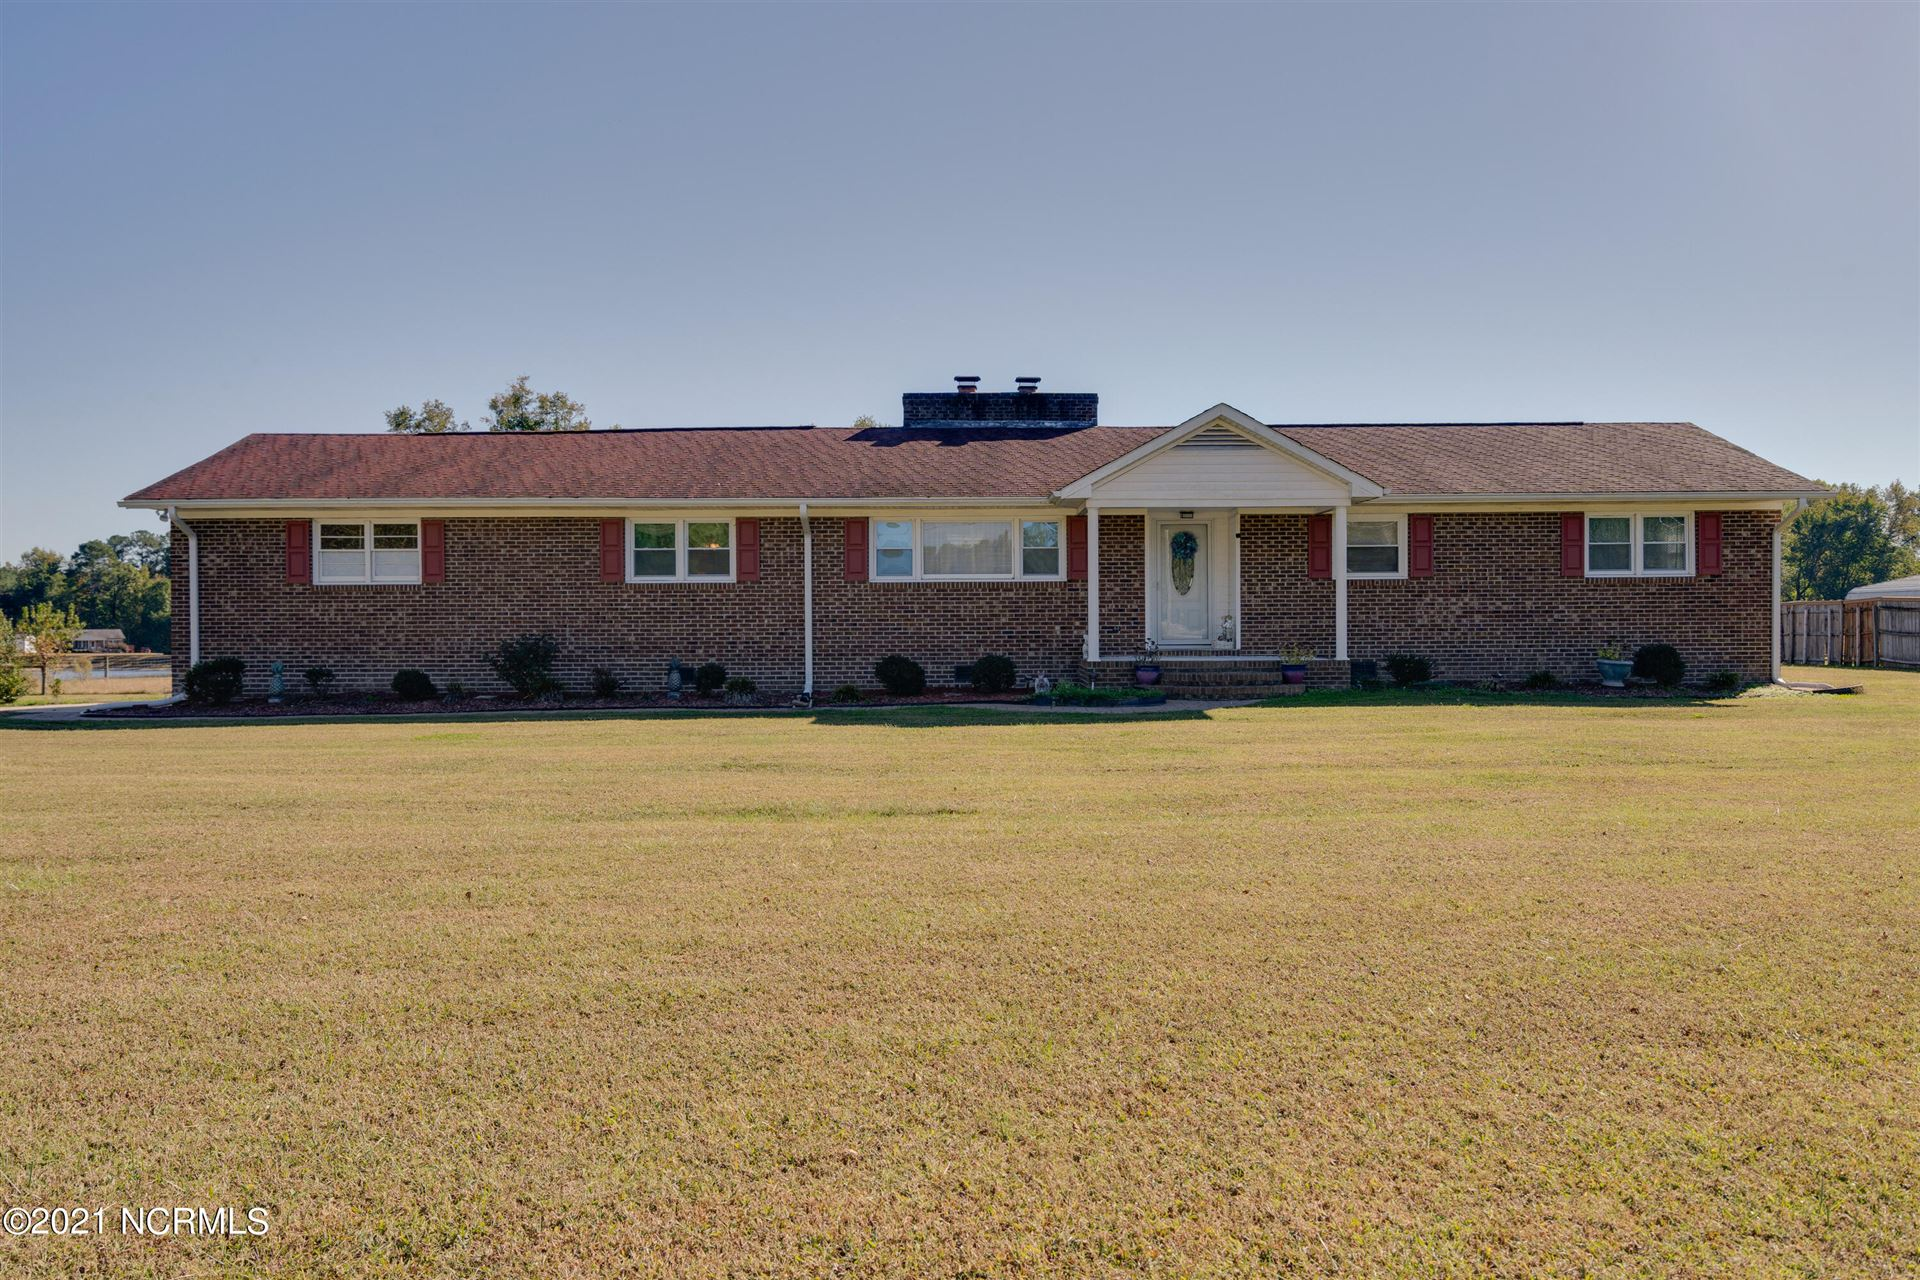 Photo of 245 Pilot-Riley Road, Zebulon, NC 27597 (MLS # 100296080)